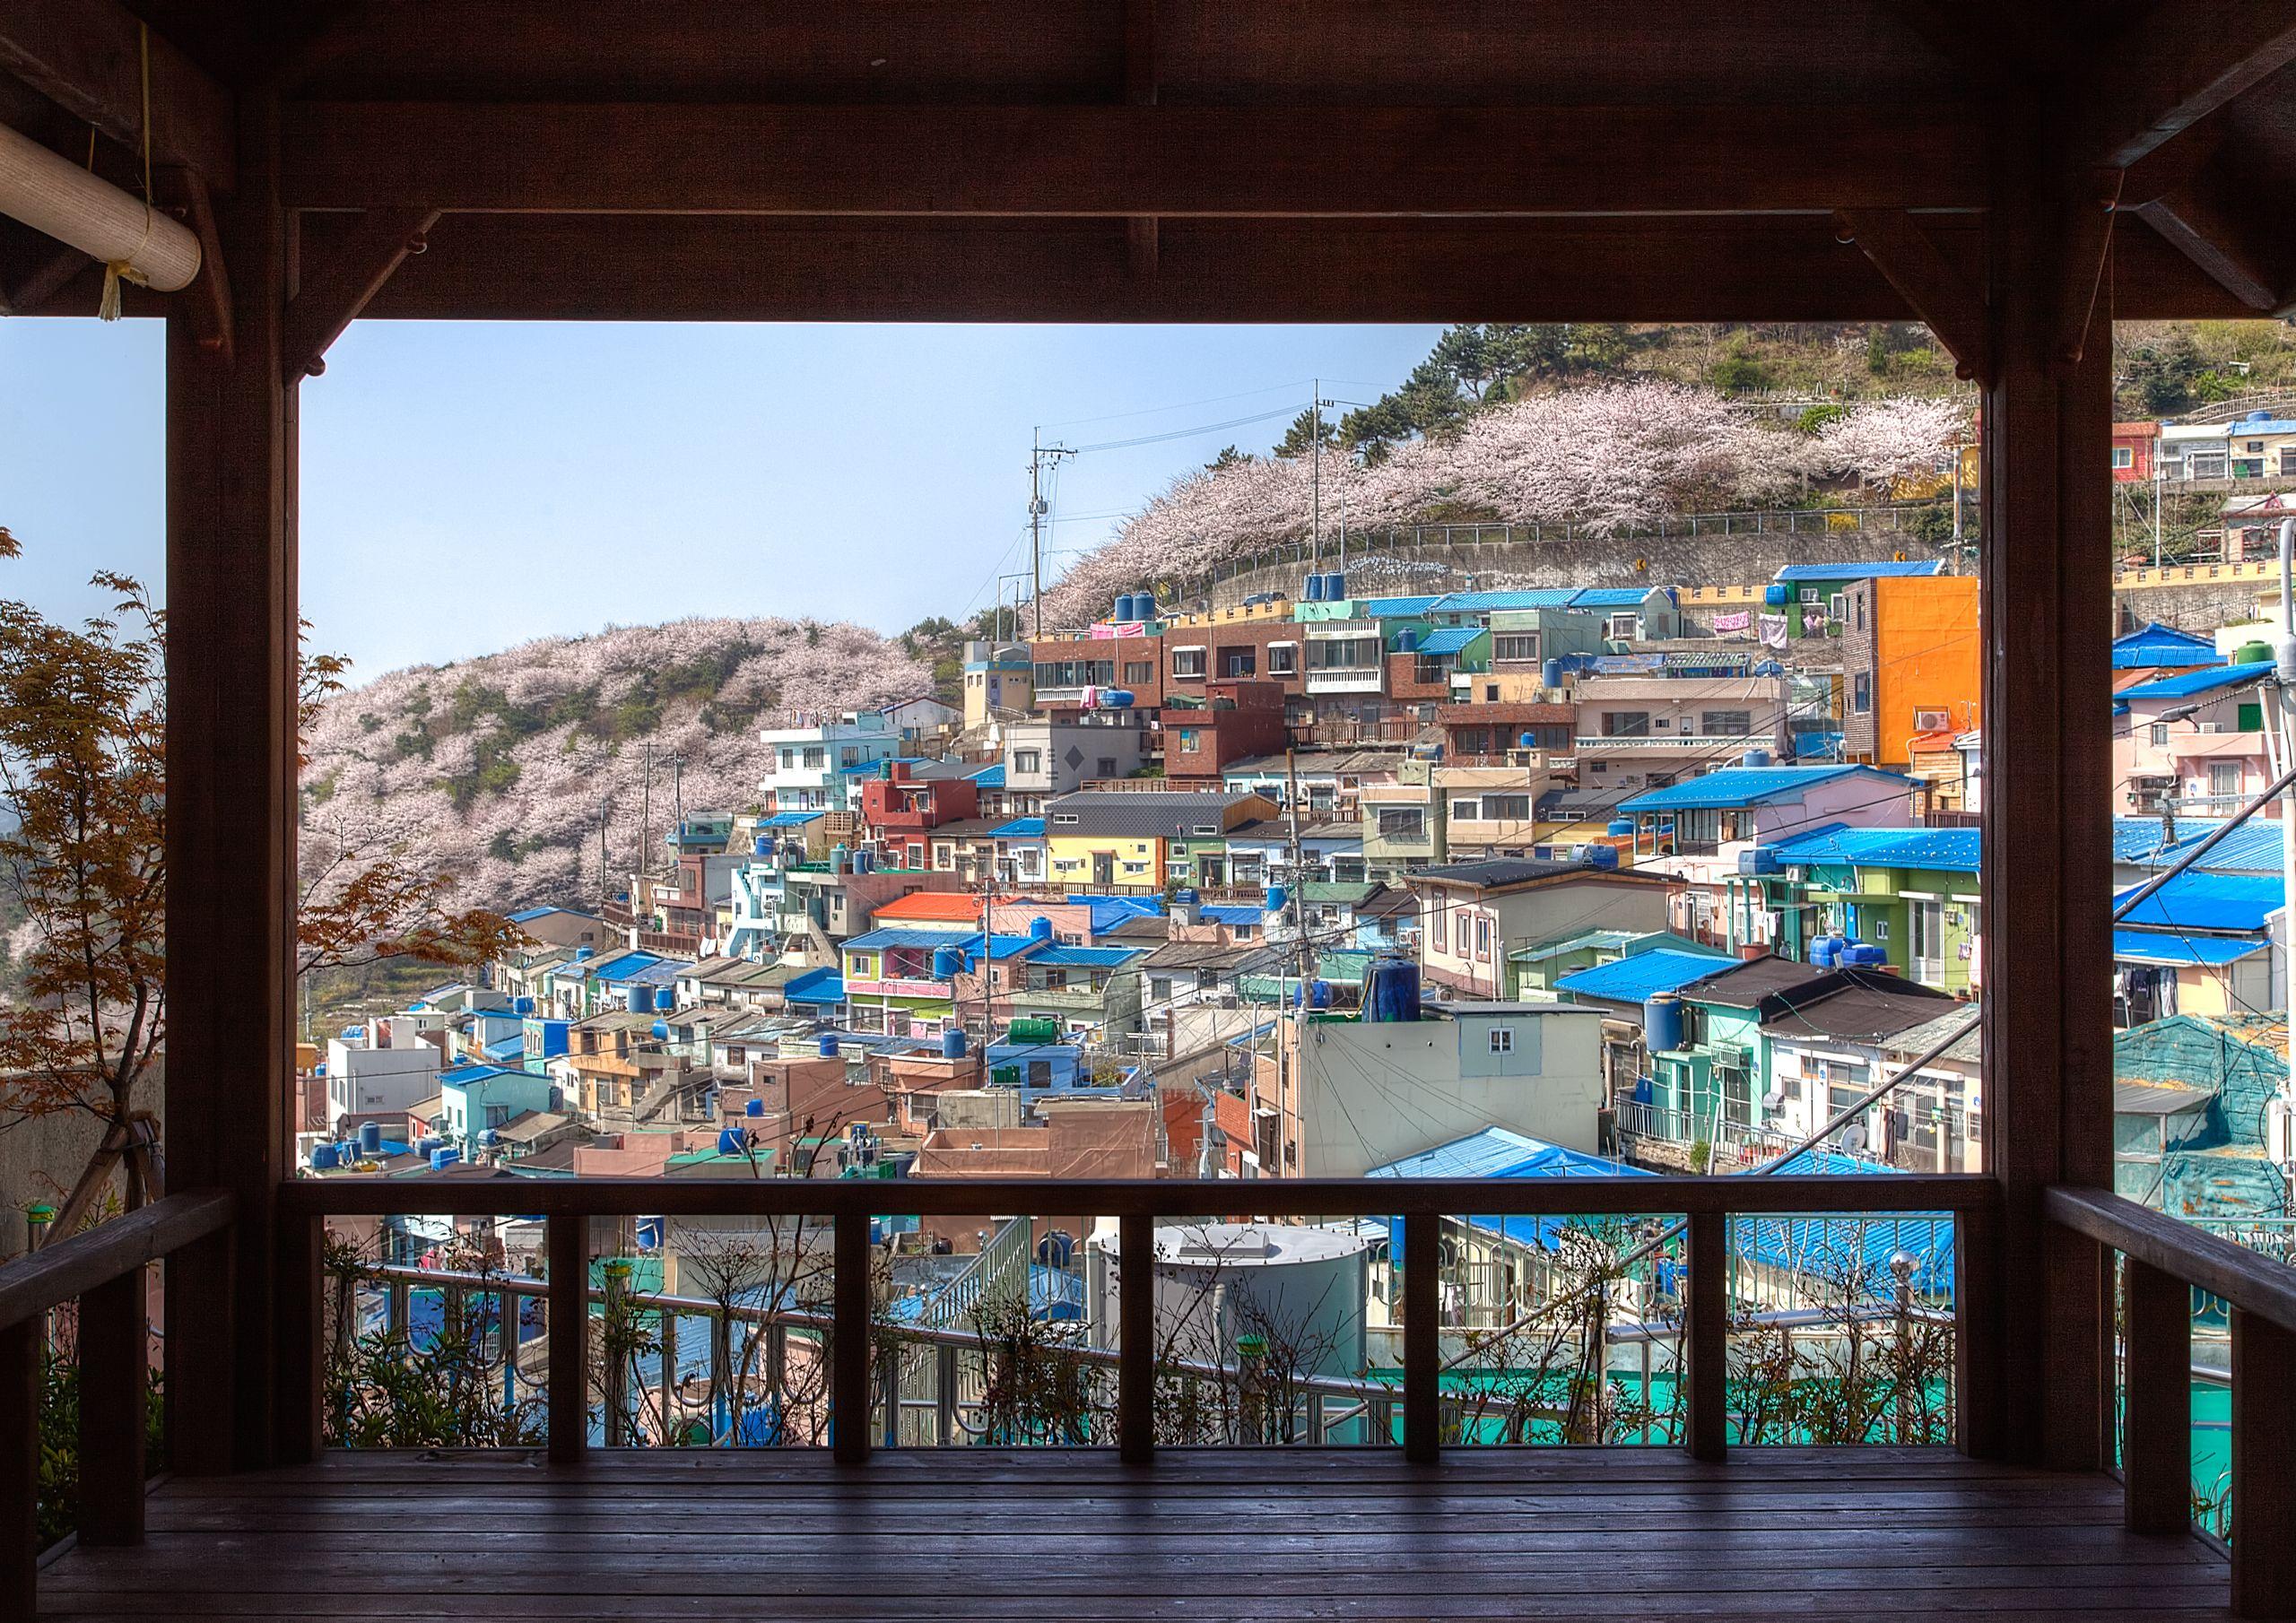 甘川文化村-Gamcheon Culture Village,Busan,Korea   韓國